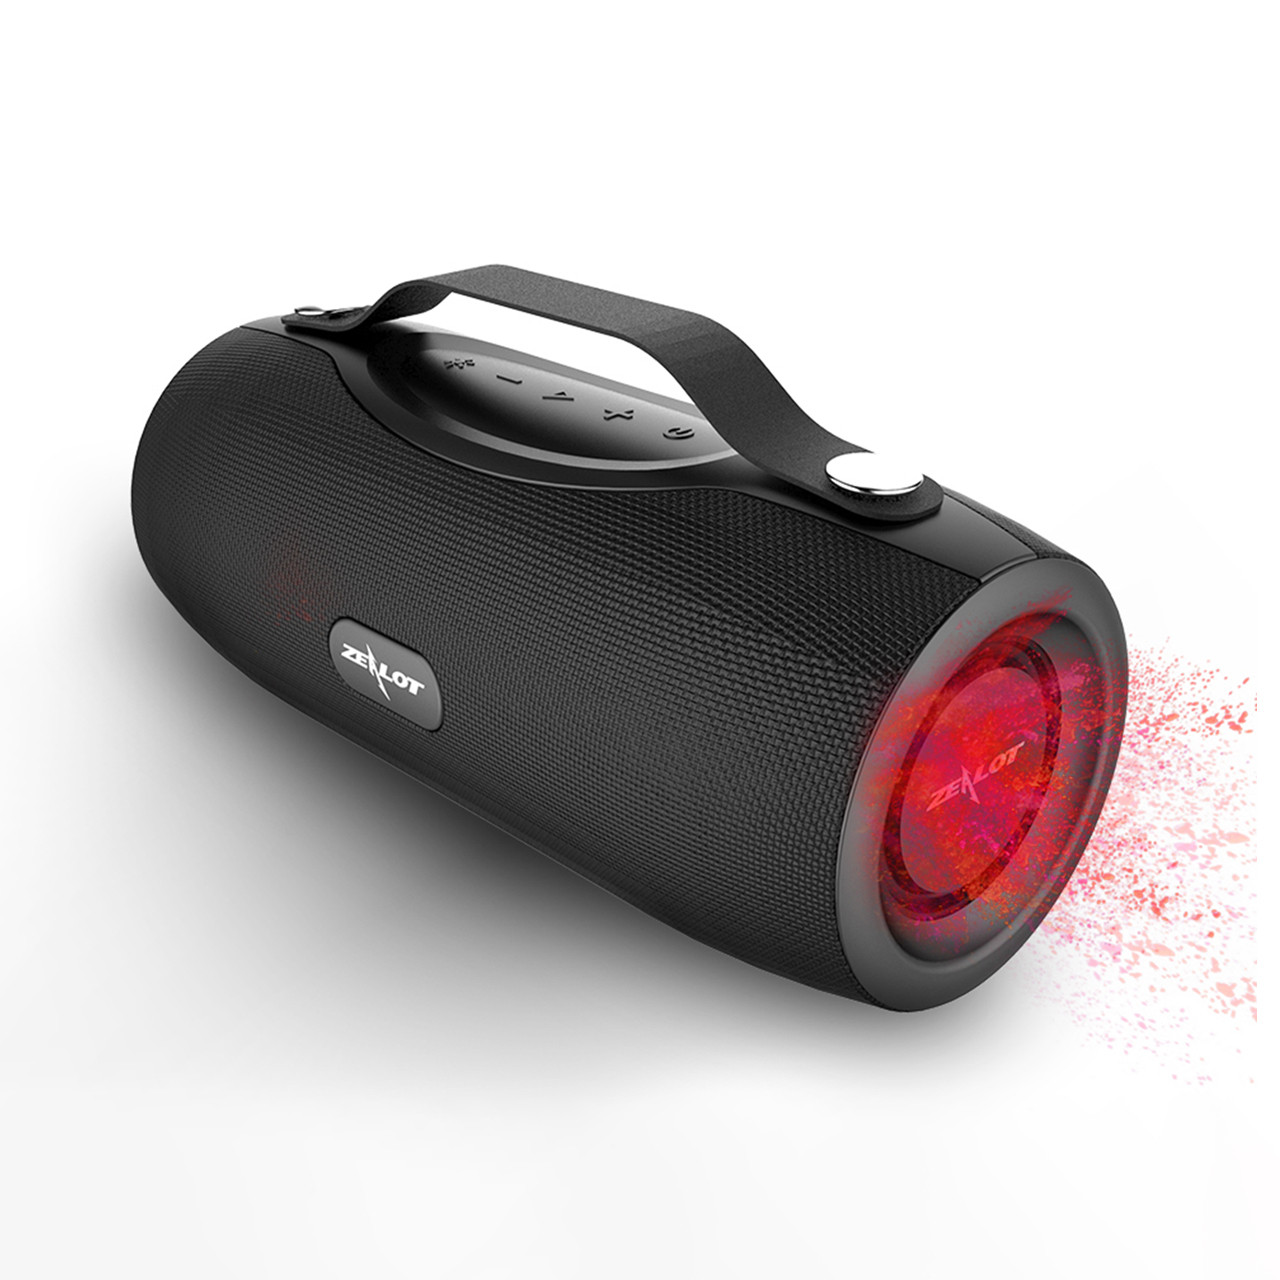 Блютуз колонка ZEALOT S29 Black портативная радио 10 Вт Power Bank Фонарик батарея 2000 мАч